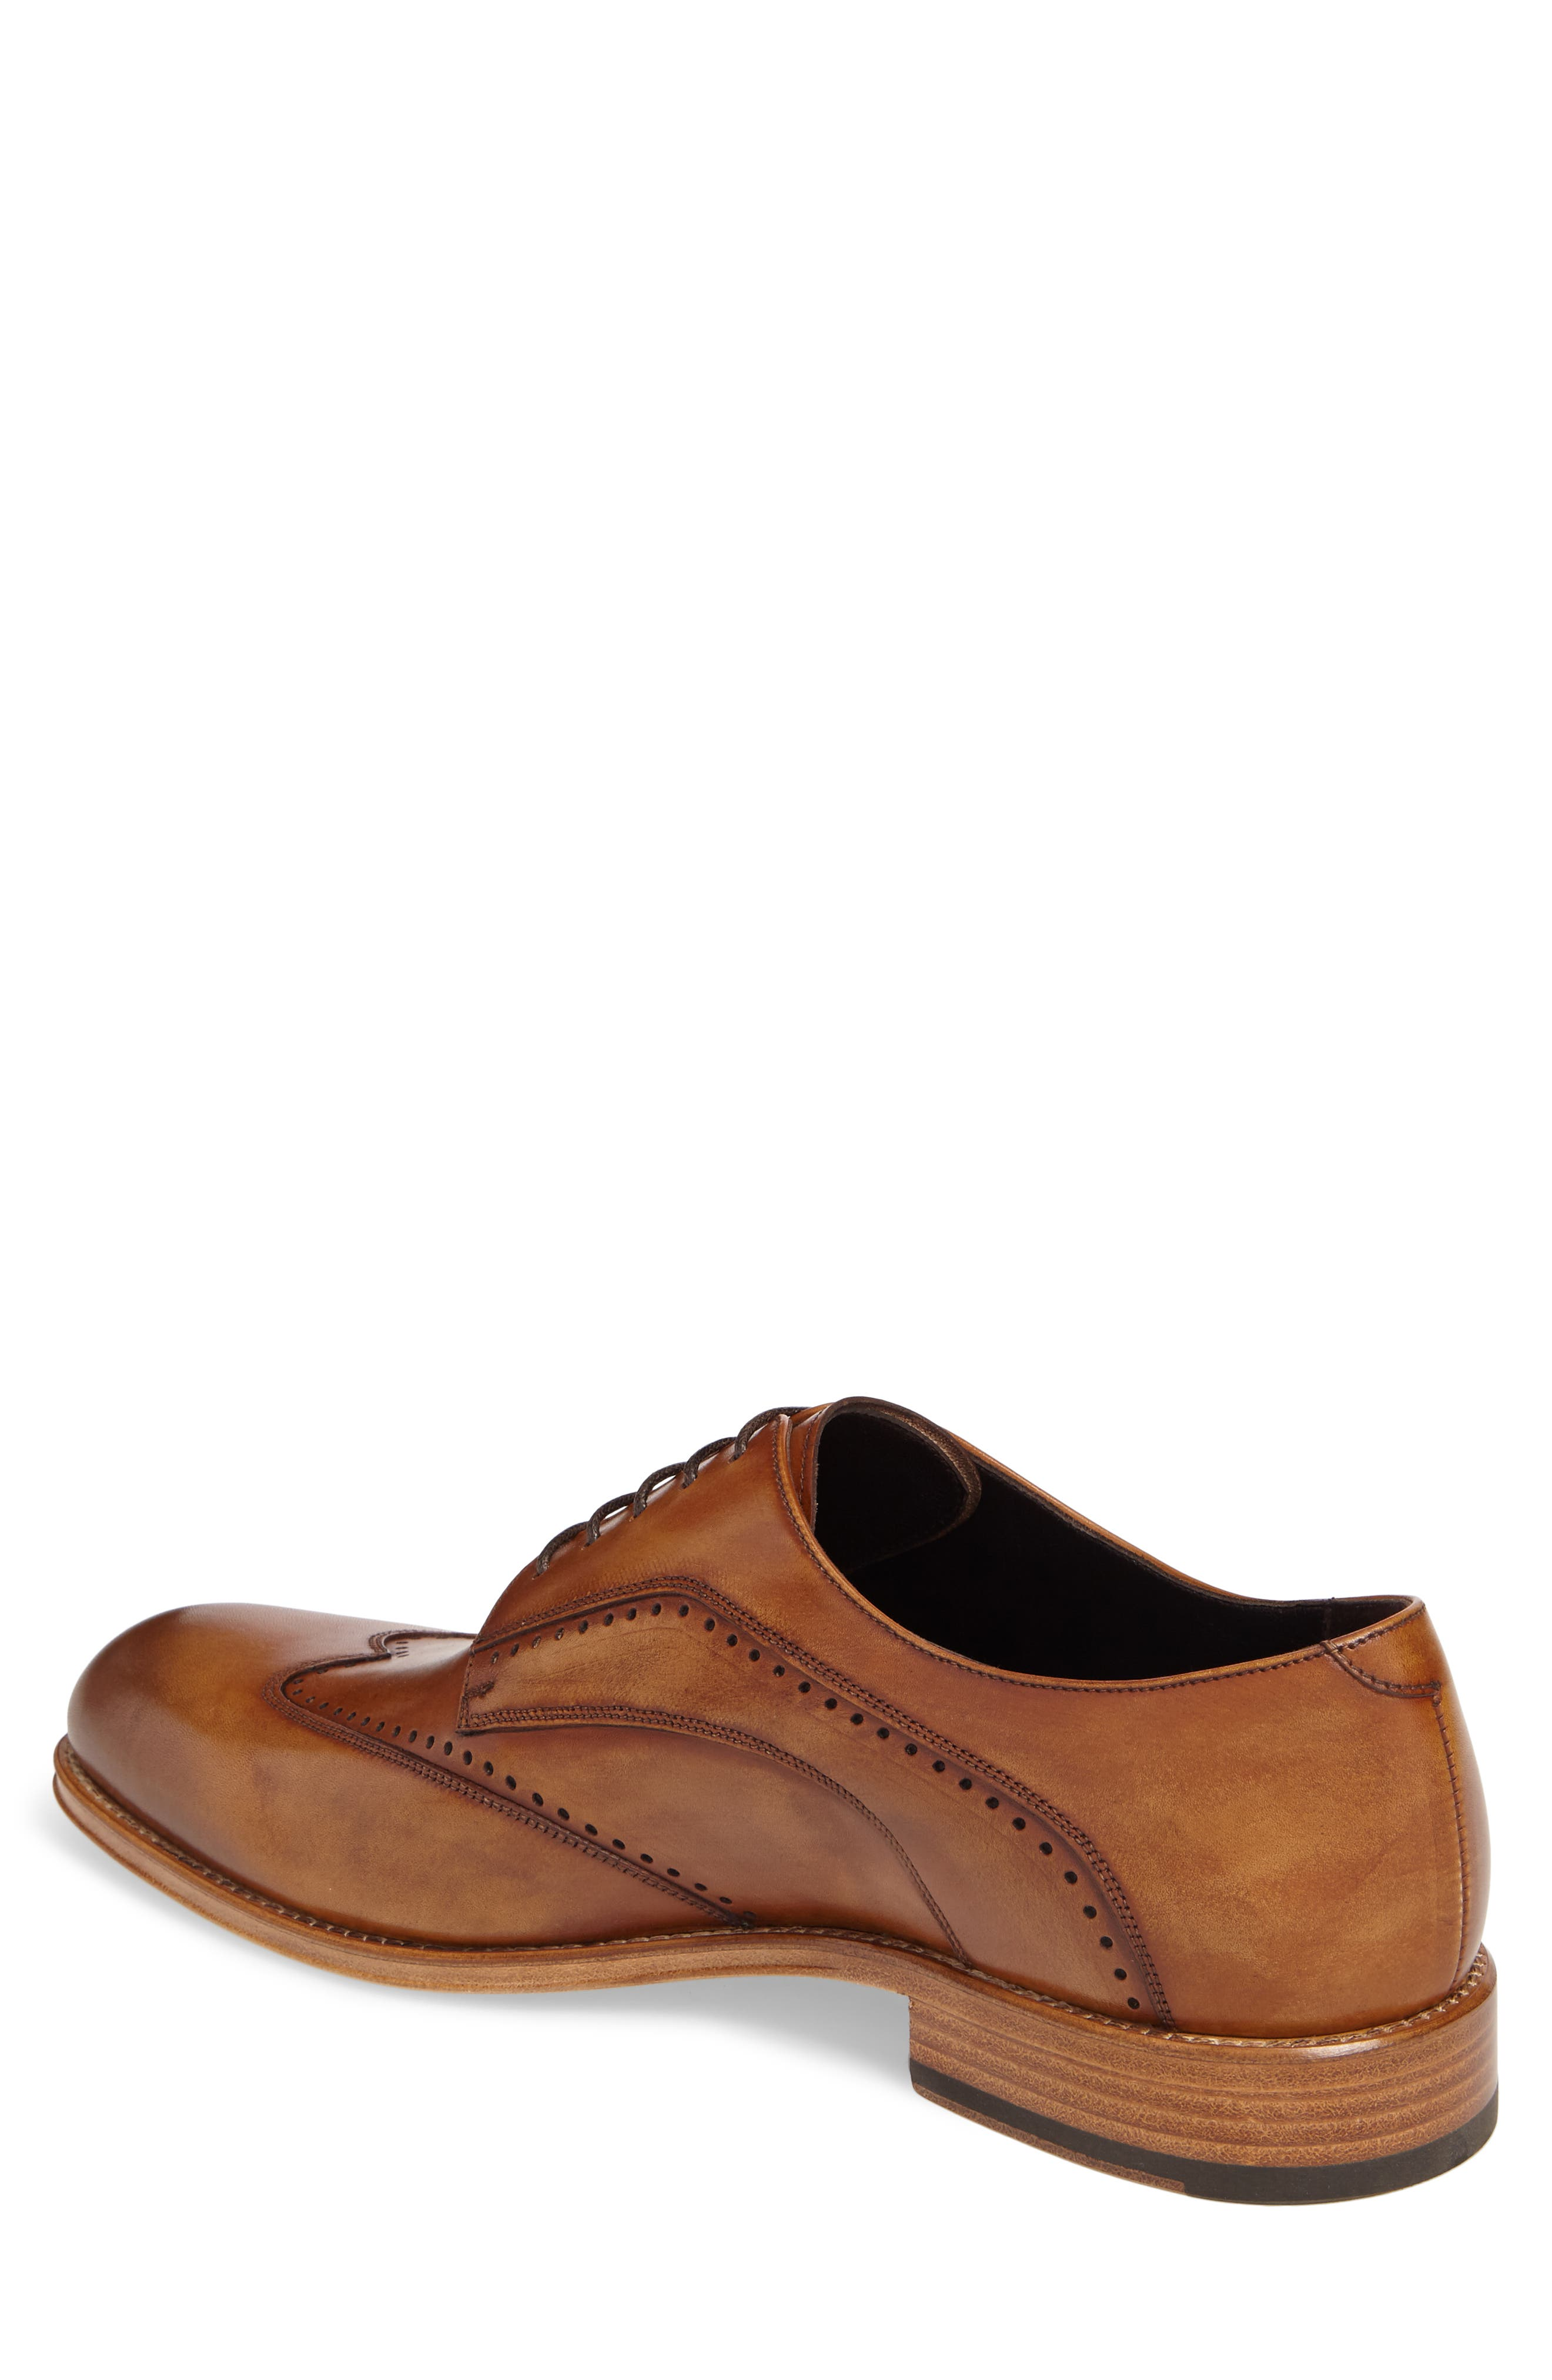 Francesco Wingtip Derby,                             Alternate thumbnail 2, color,                             Tan Leather